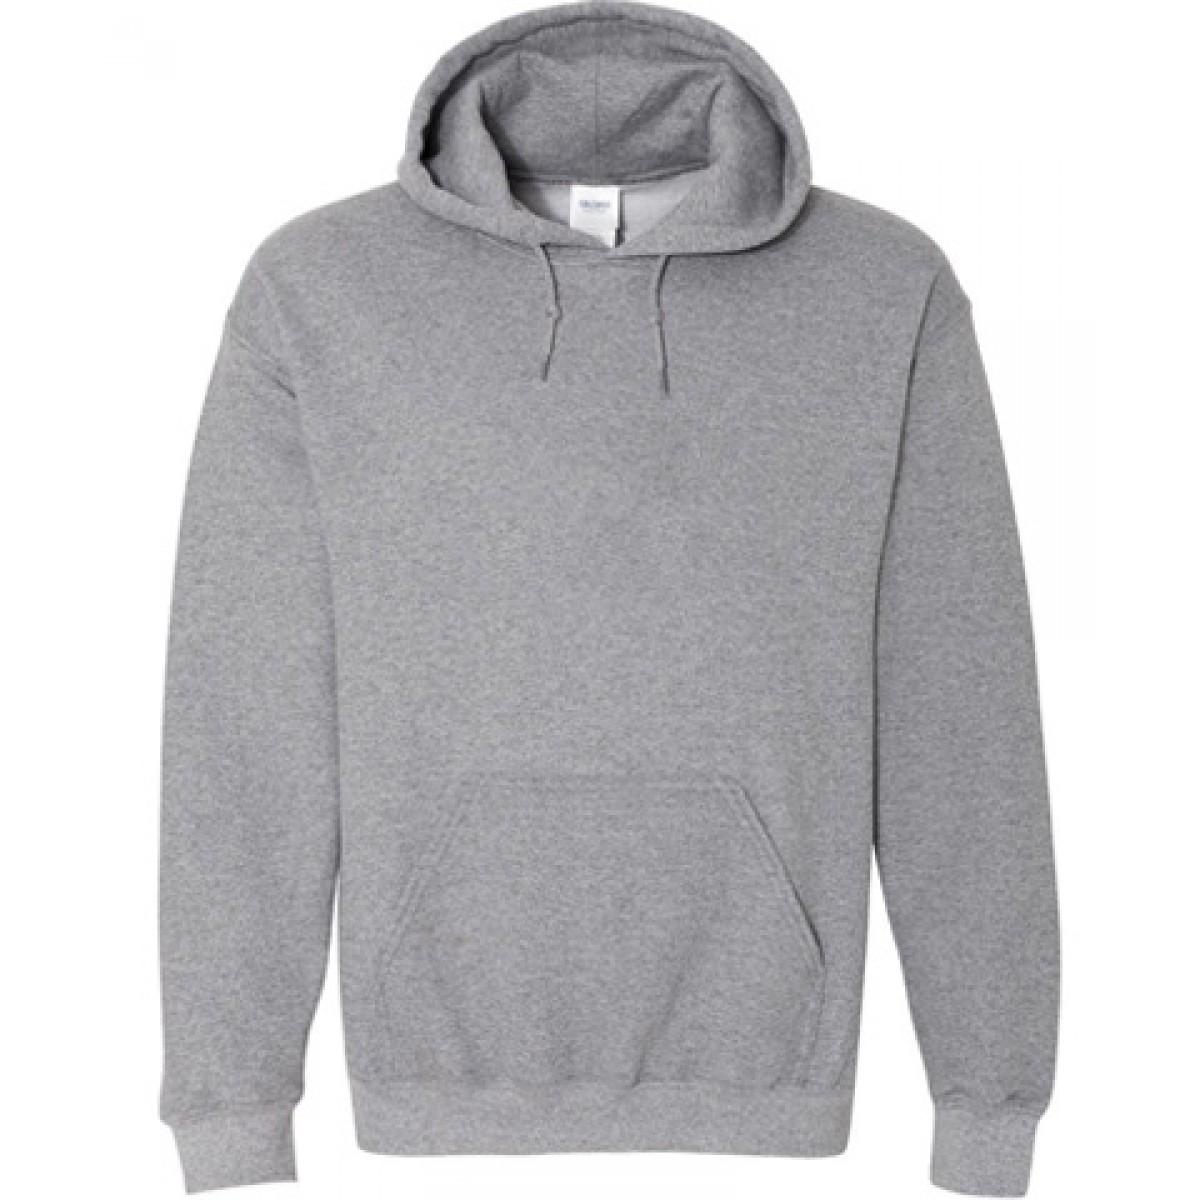 Hooded Sweatshirt 50/50 Heavy Blend-Gray-S